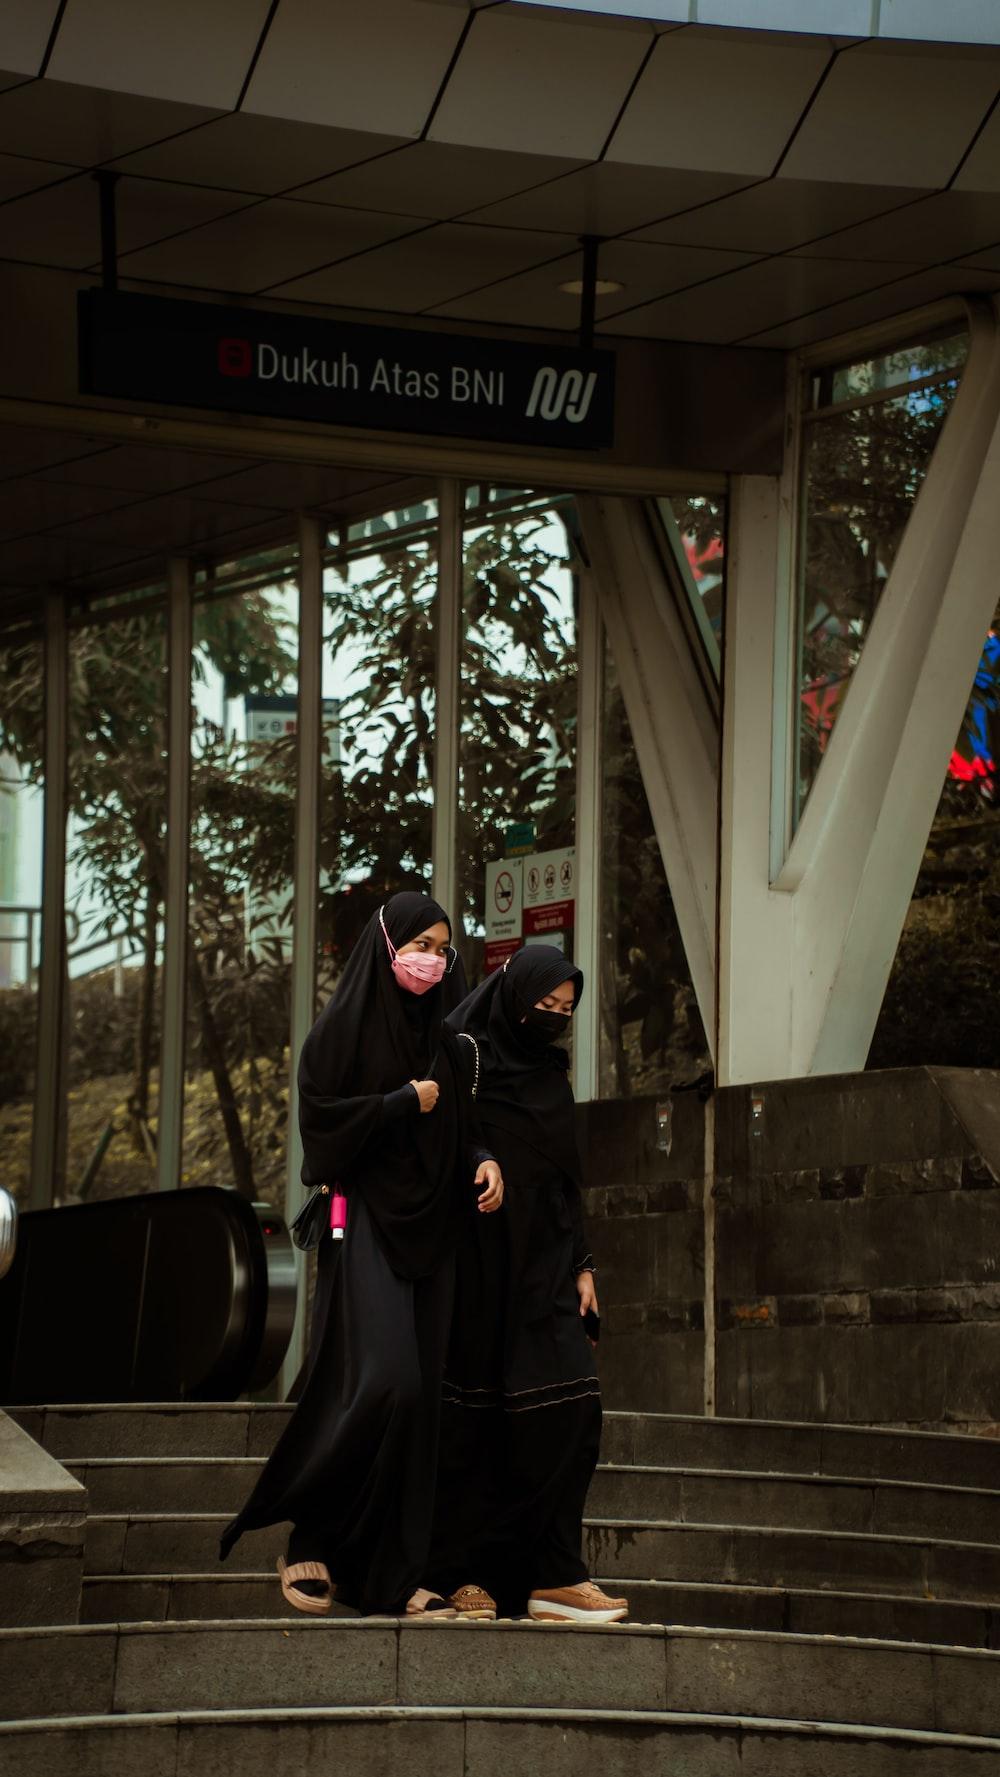 woman in black hijab standing near glass window